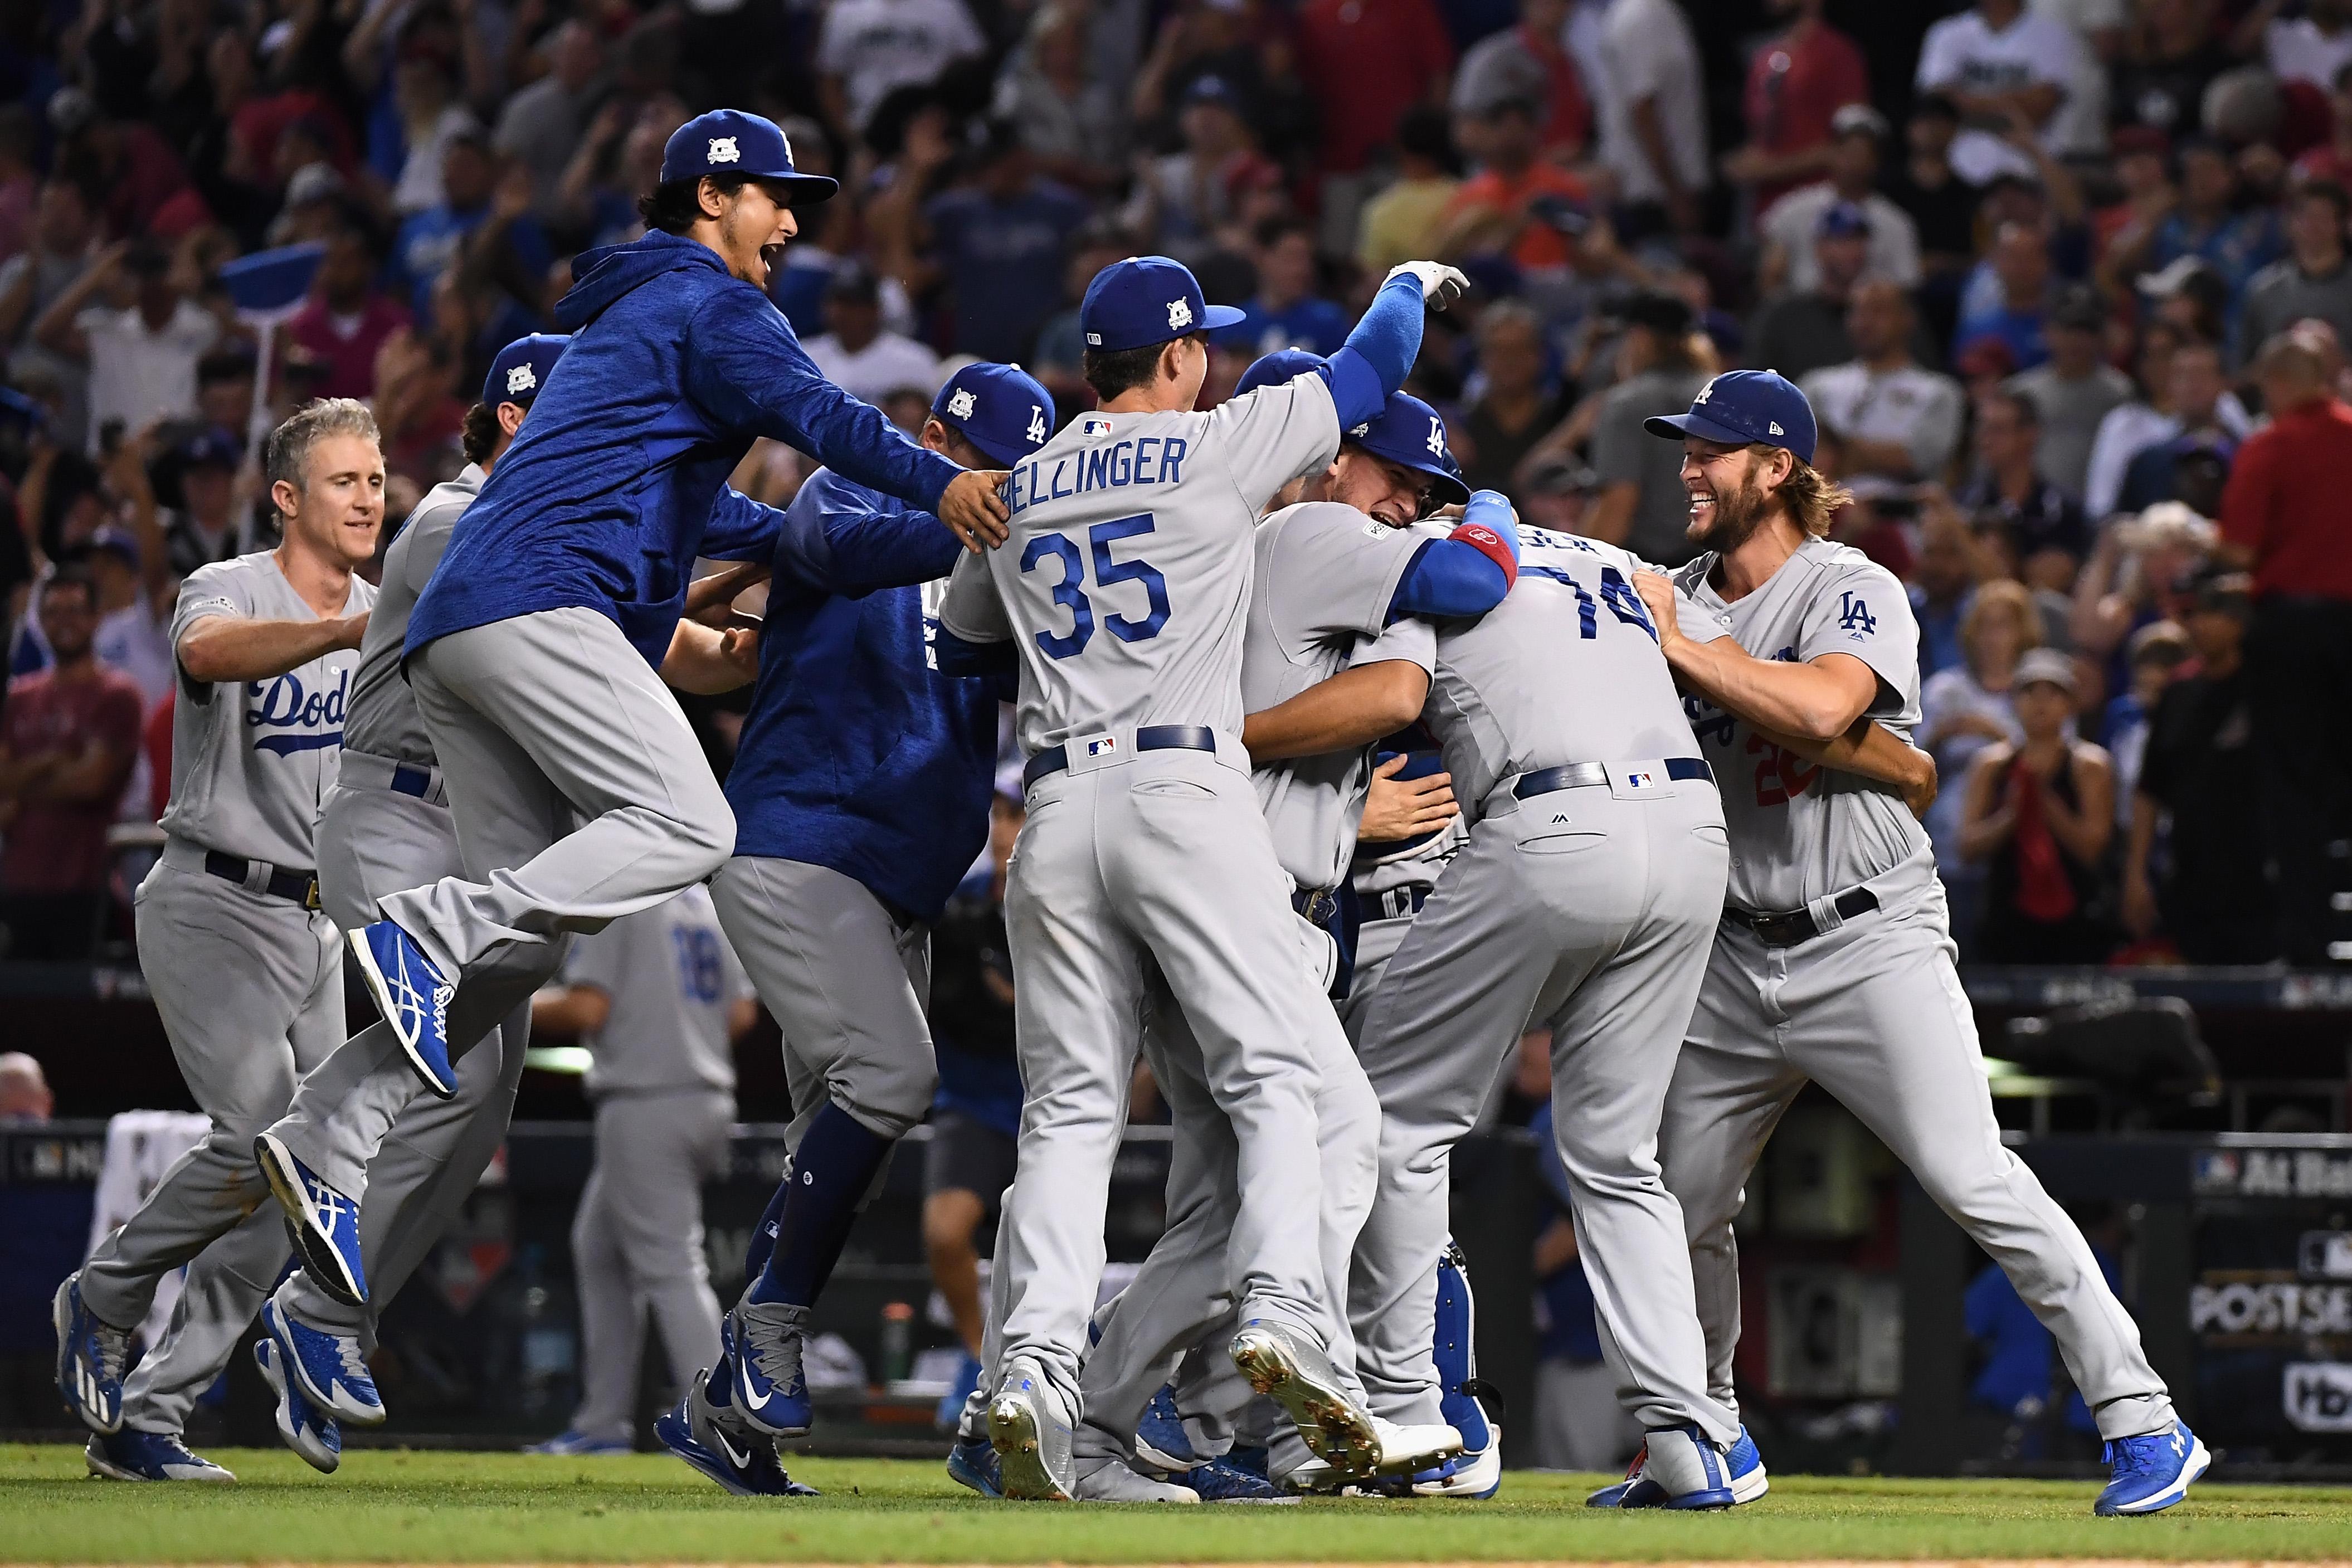 NLDS: Los Angeles Dodgers sweep away Arizona Diamondbacks, advance to NLCS